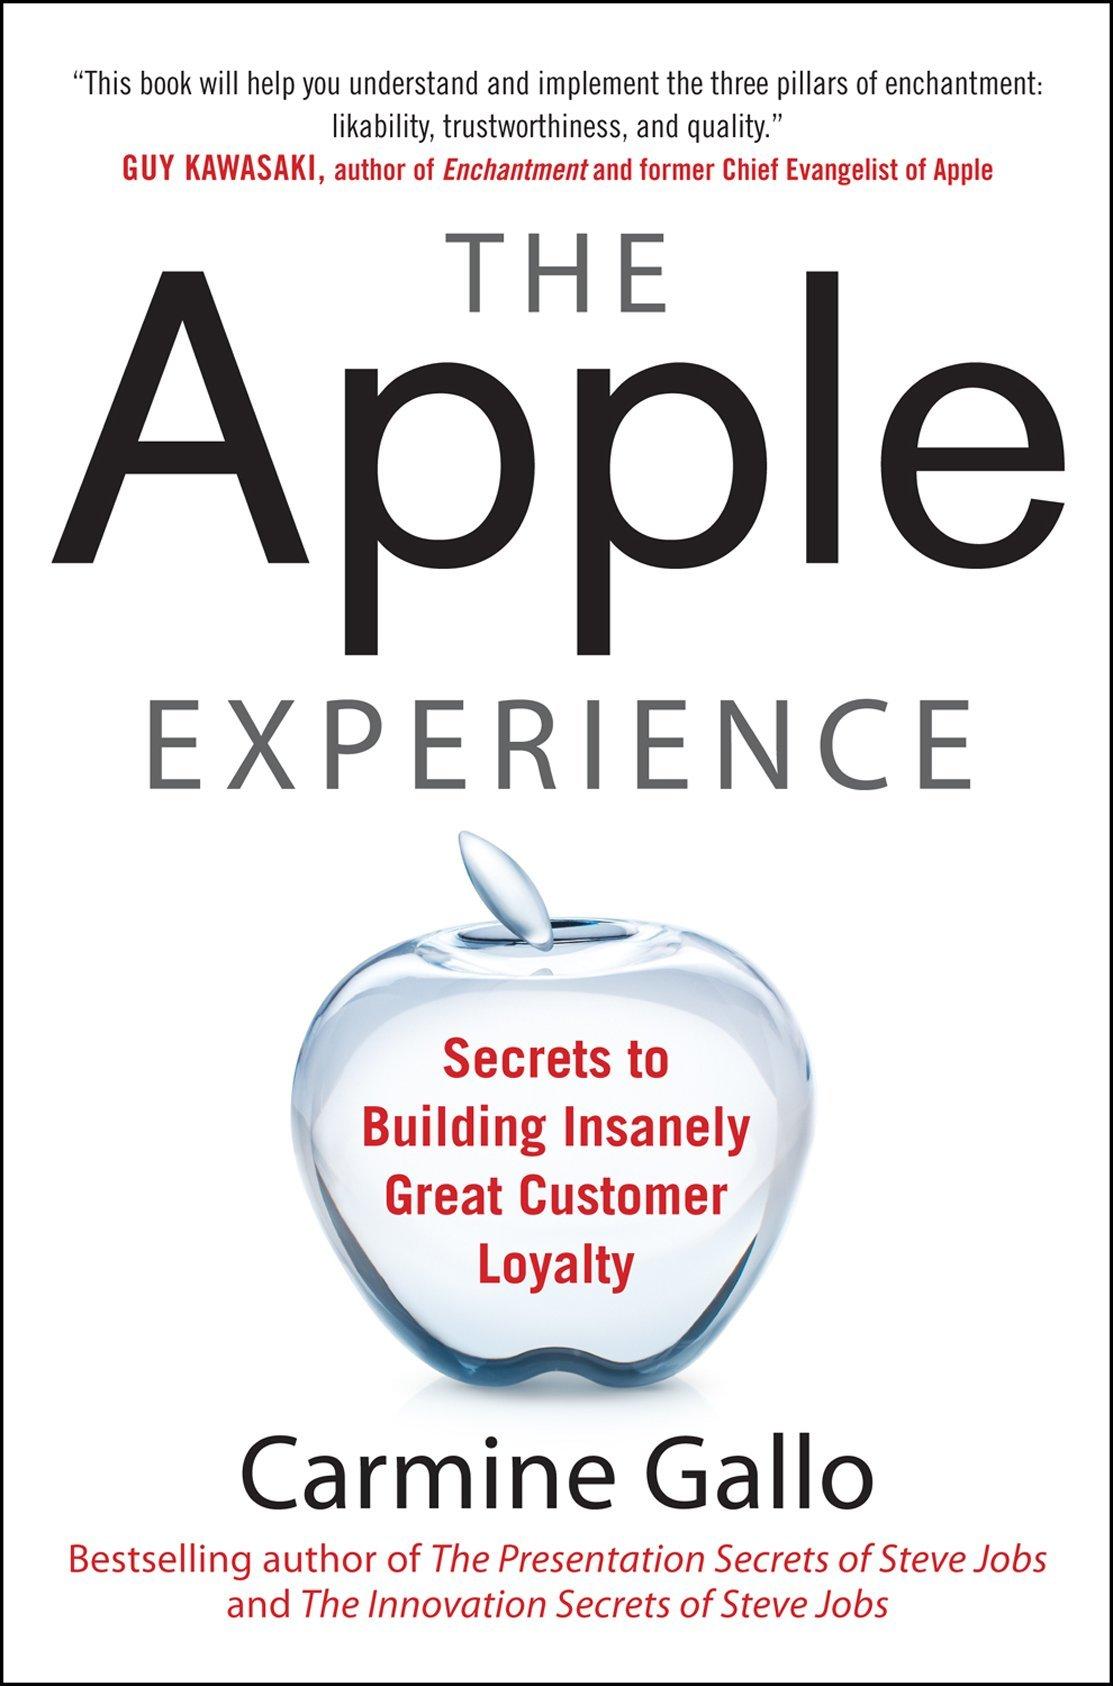 Experience gallo apple the pdf carmine